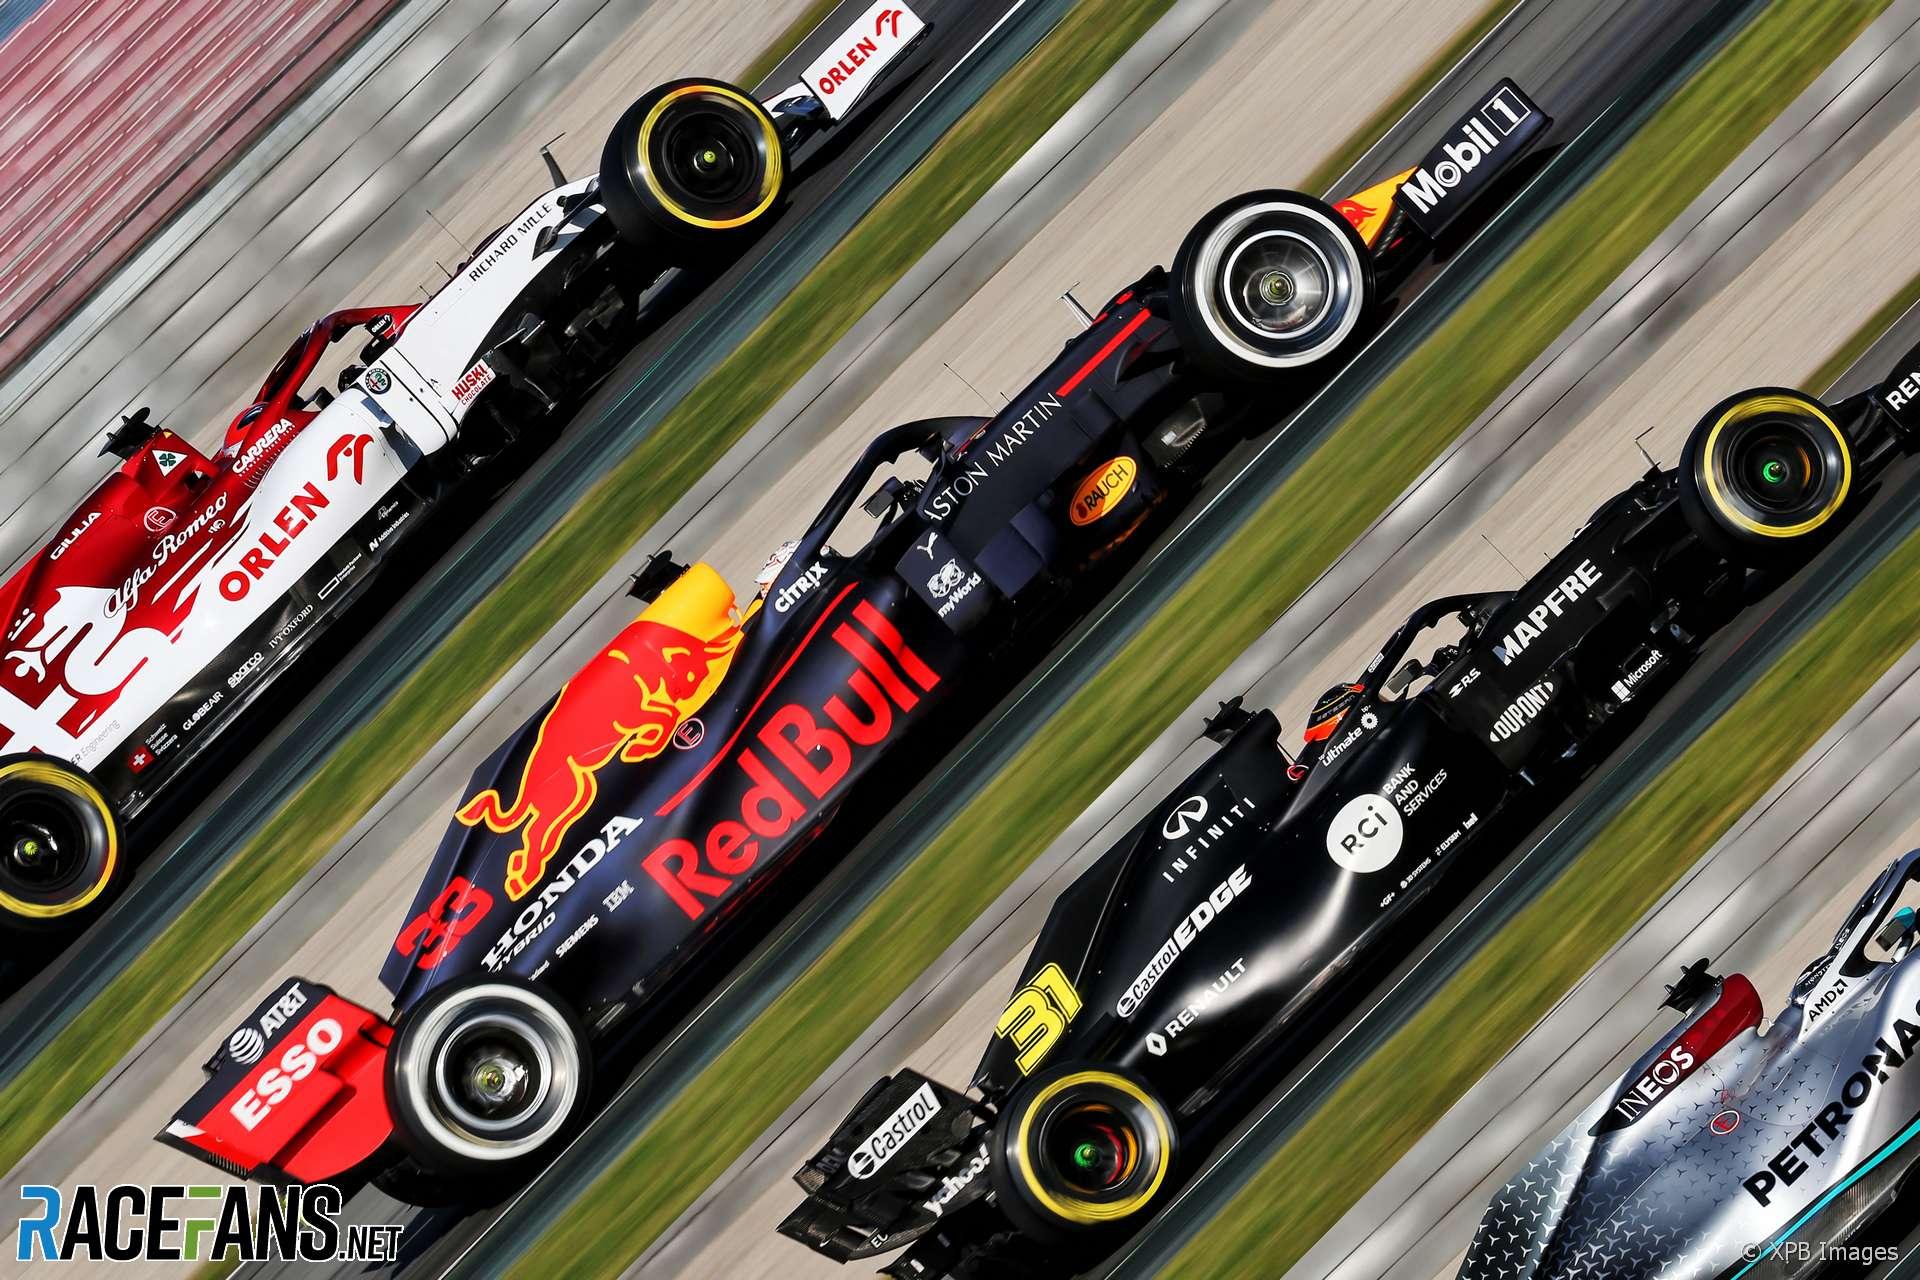 F1 cars testing, 2020